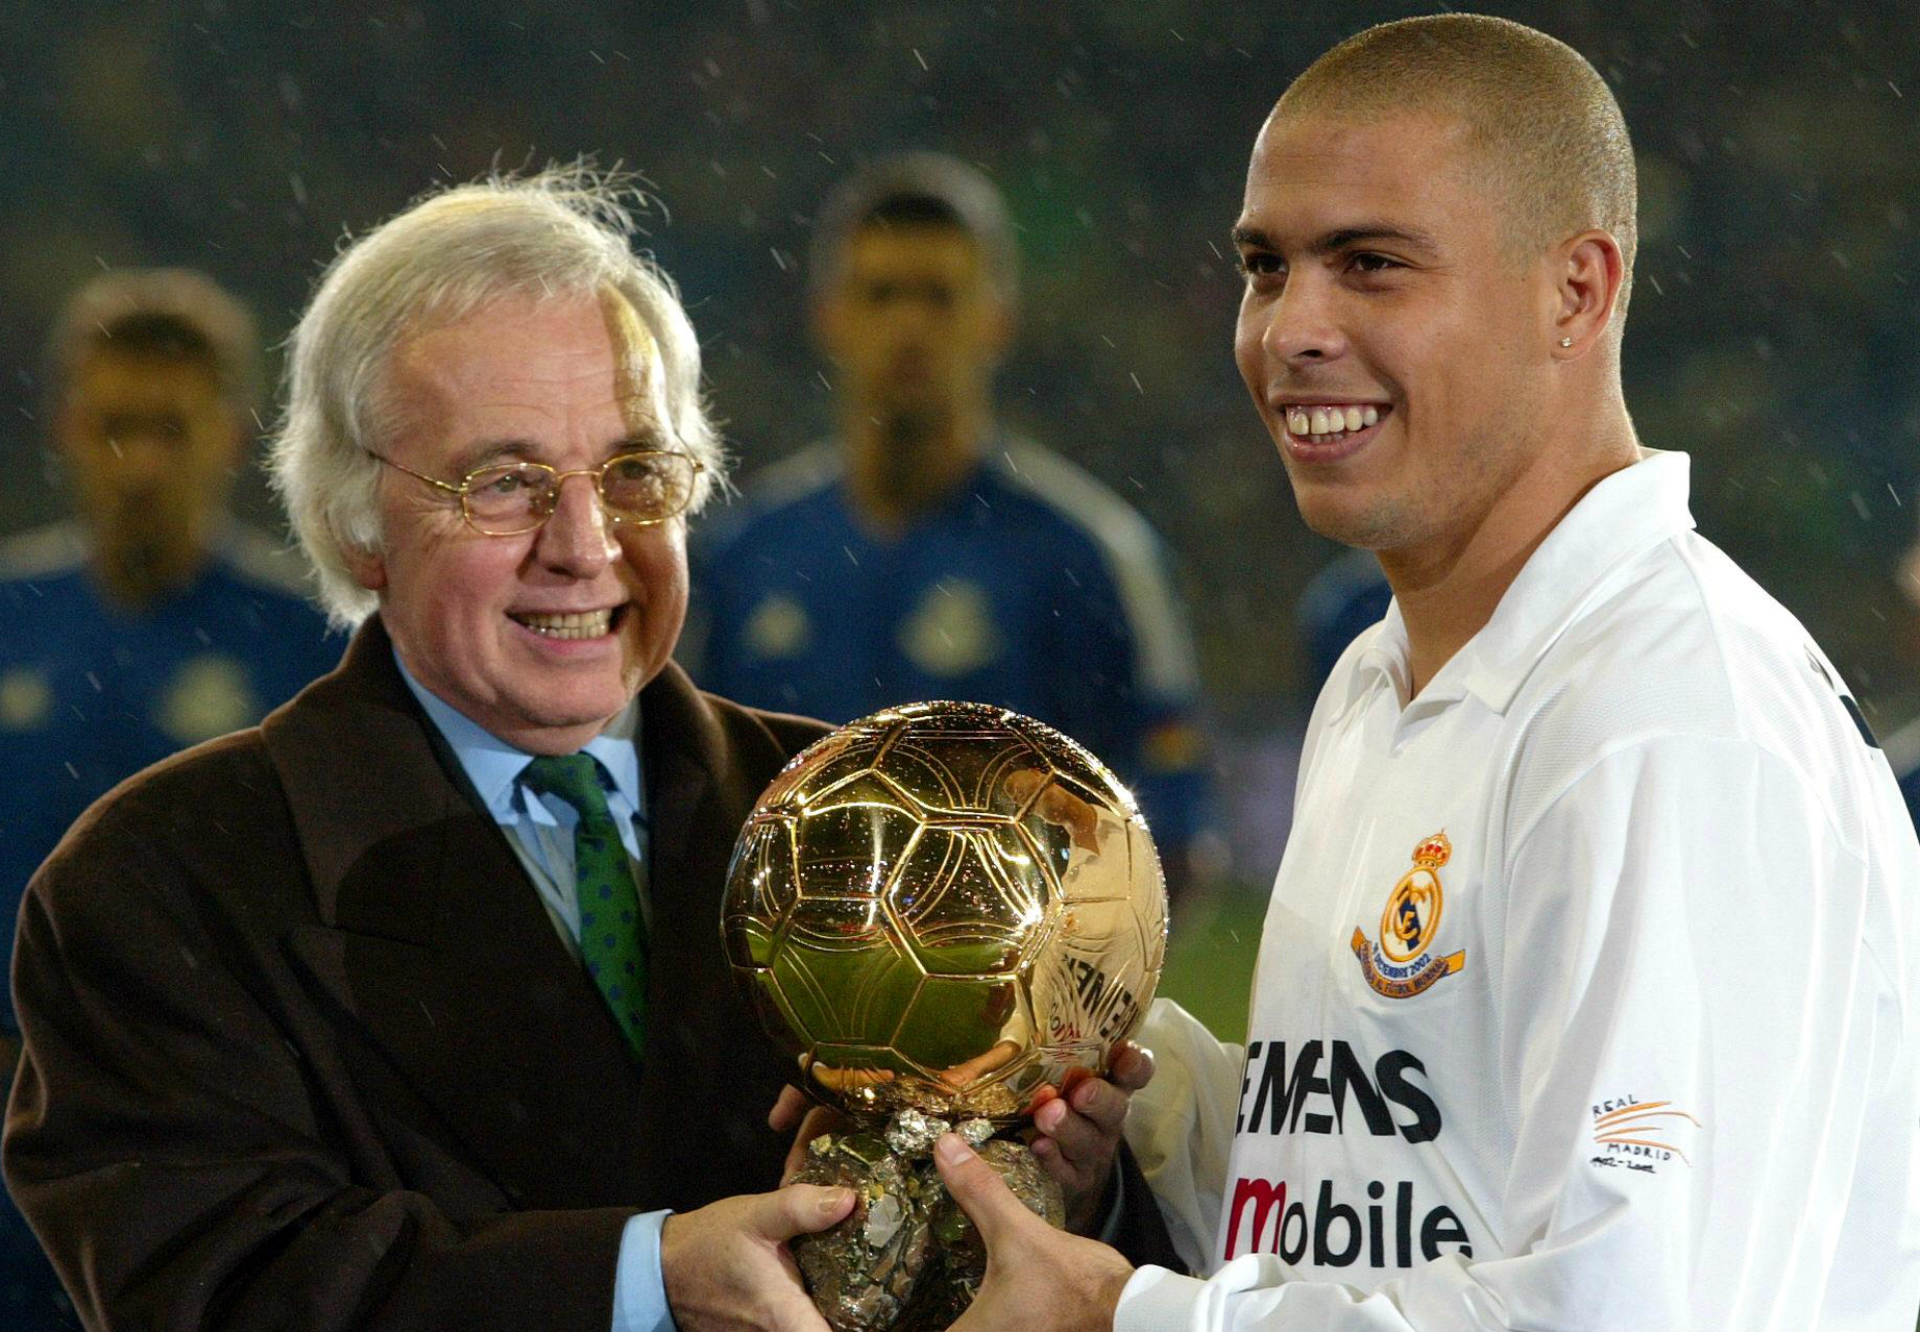 O Fenomeno - How Ronaldo won three Ballon d'Ors | Goal.com